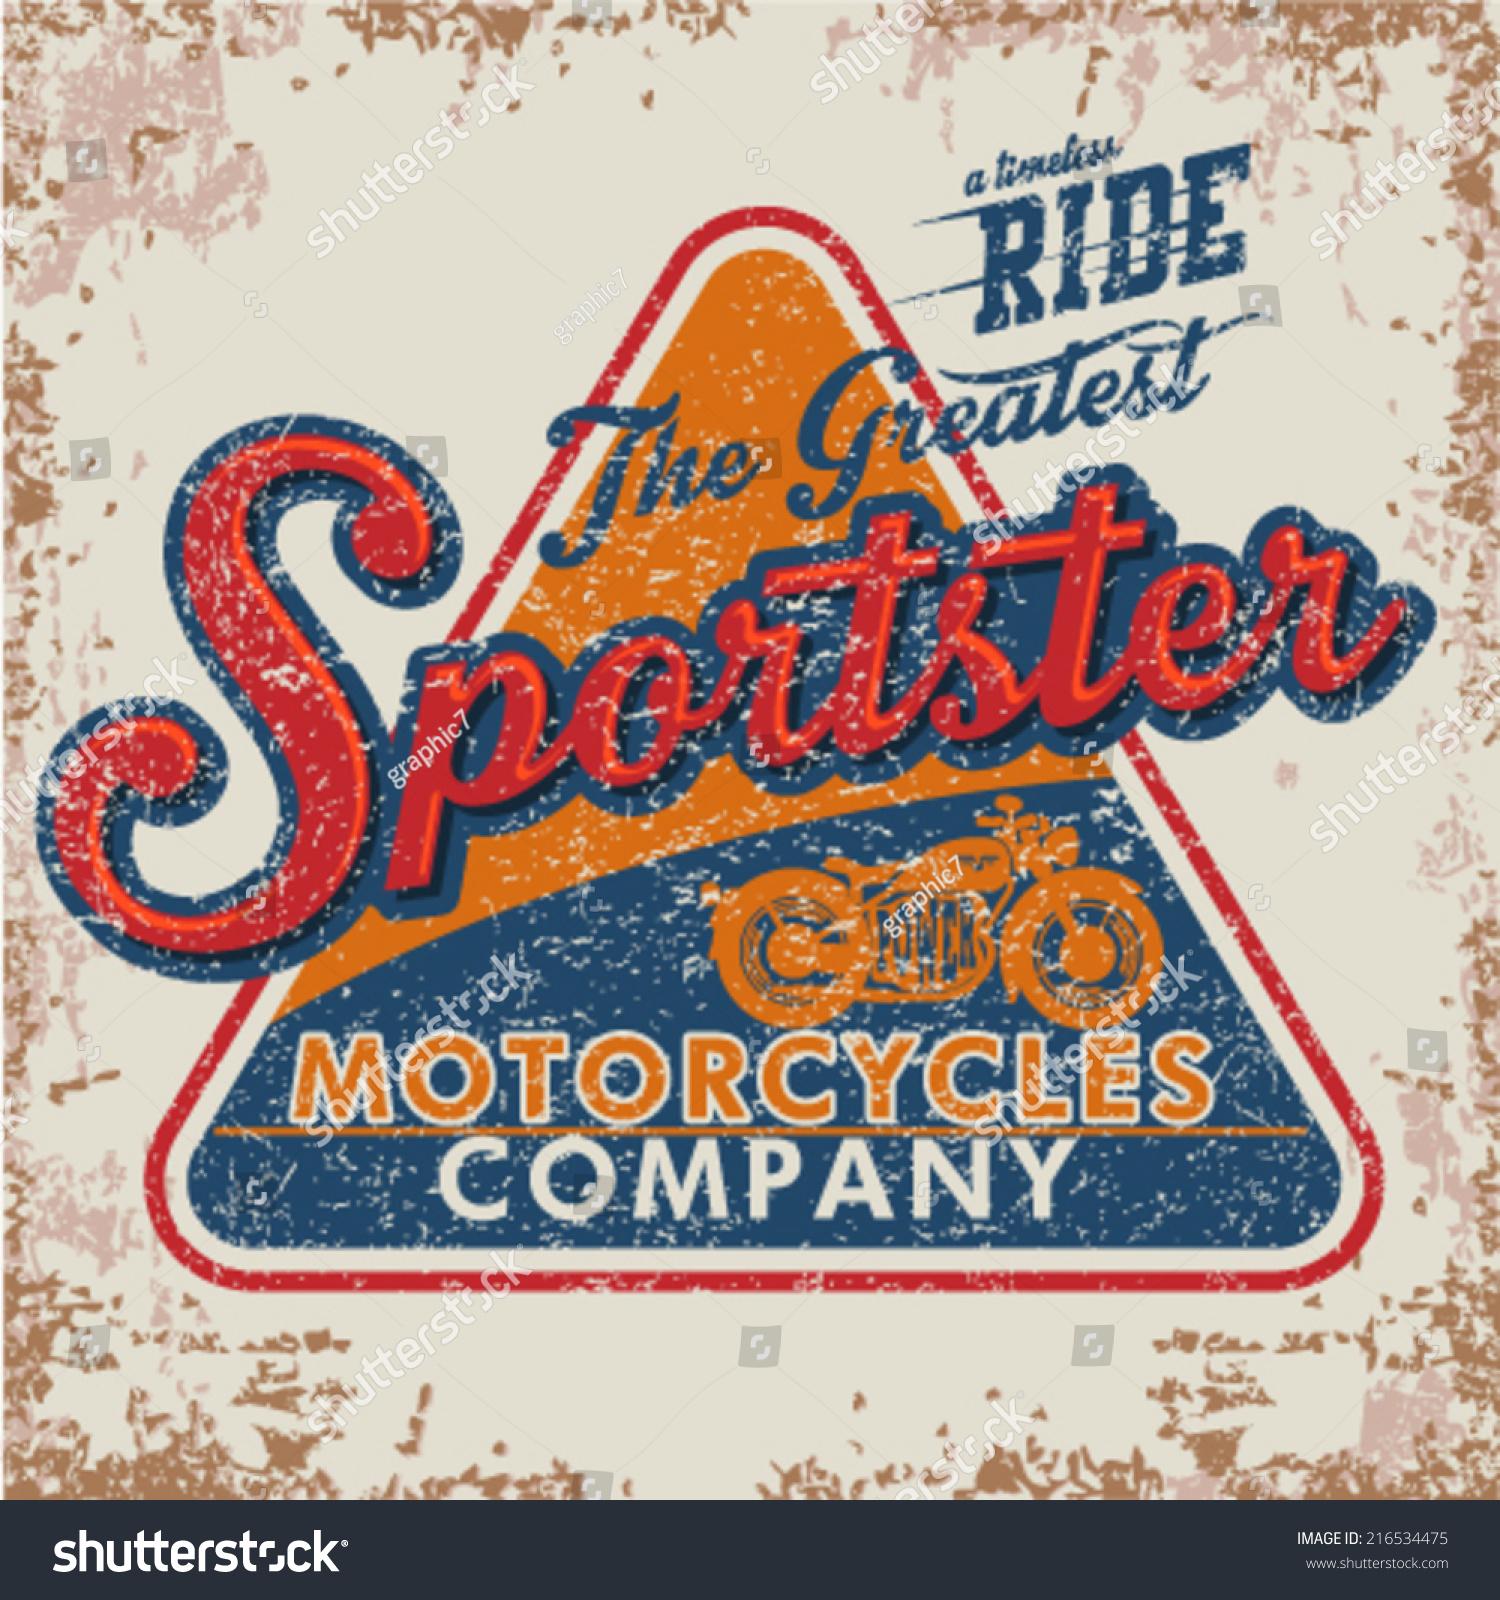 Design t shirt vintage - Retro T Shirt Print Design With A Orange Motorcycle Graphic Vintage Poster Design